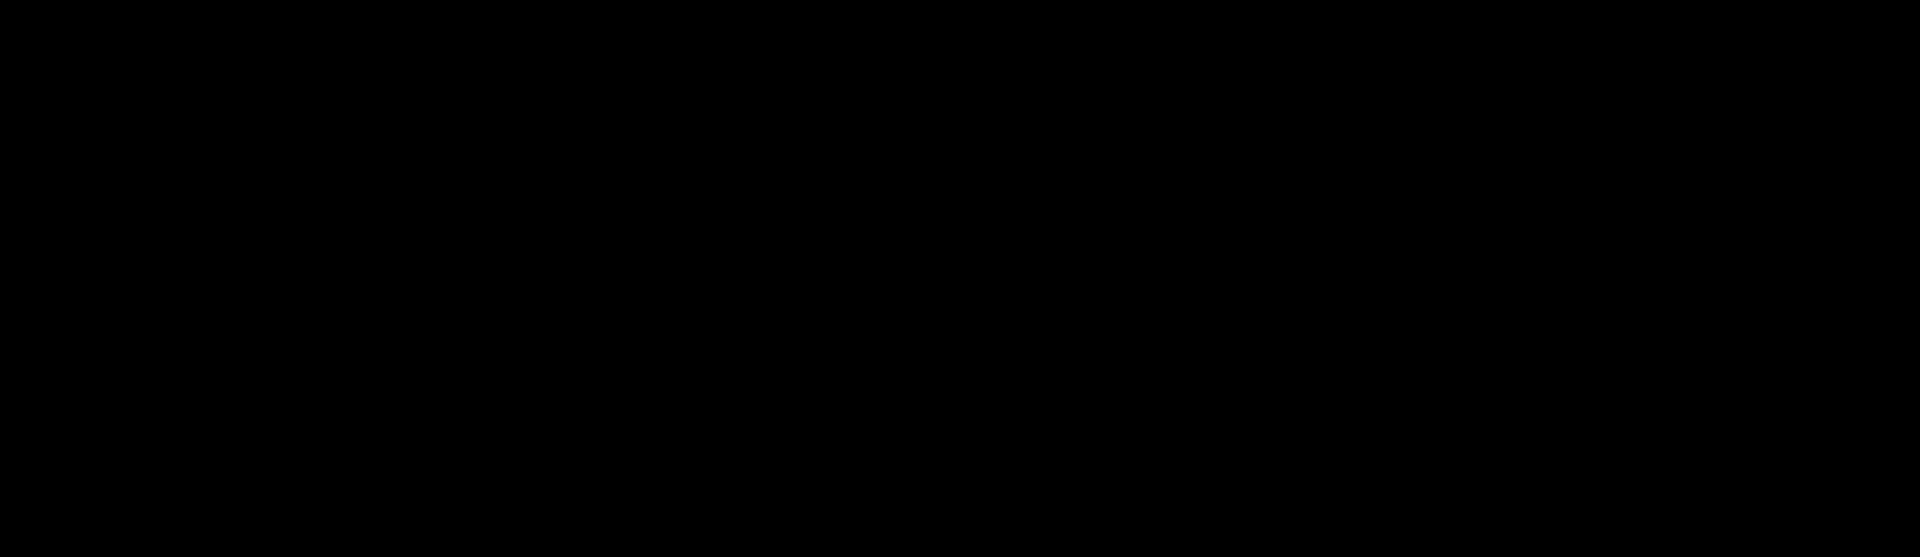 Aldol Condensation and Cannizzaro Reaction